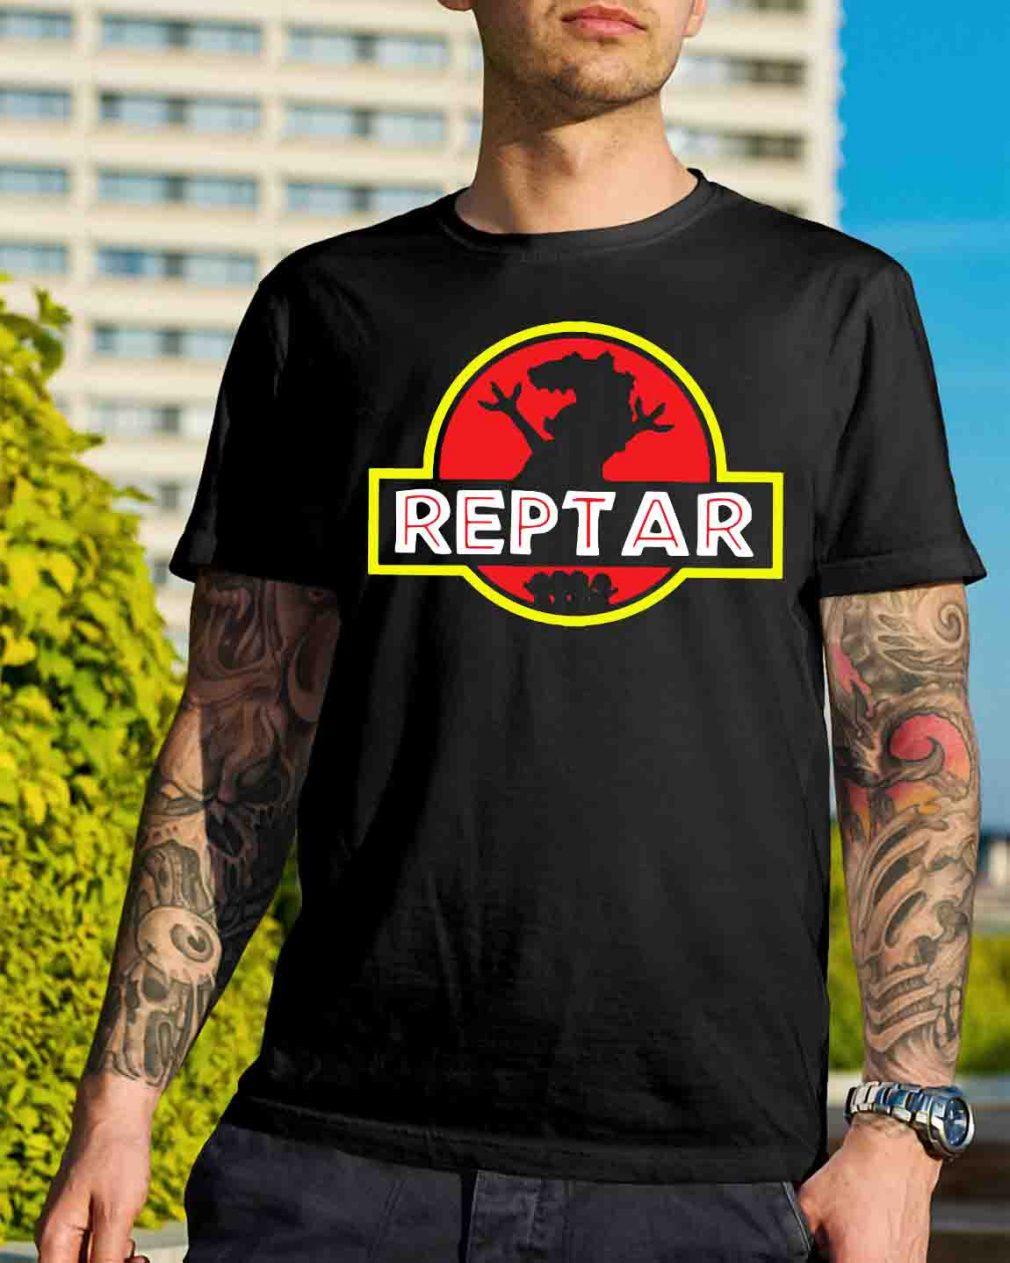 Reptar Jurassic park shirt